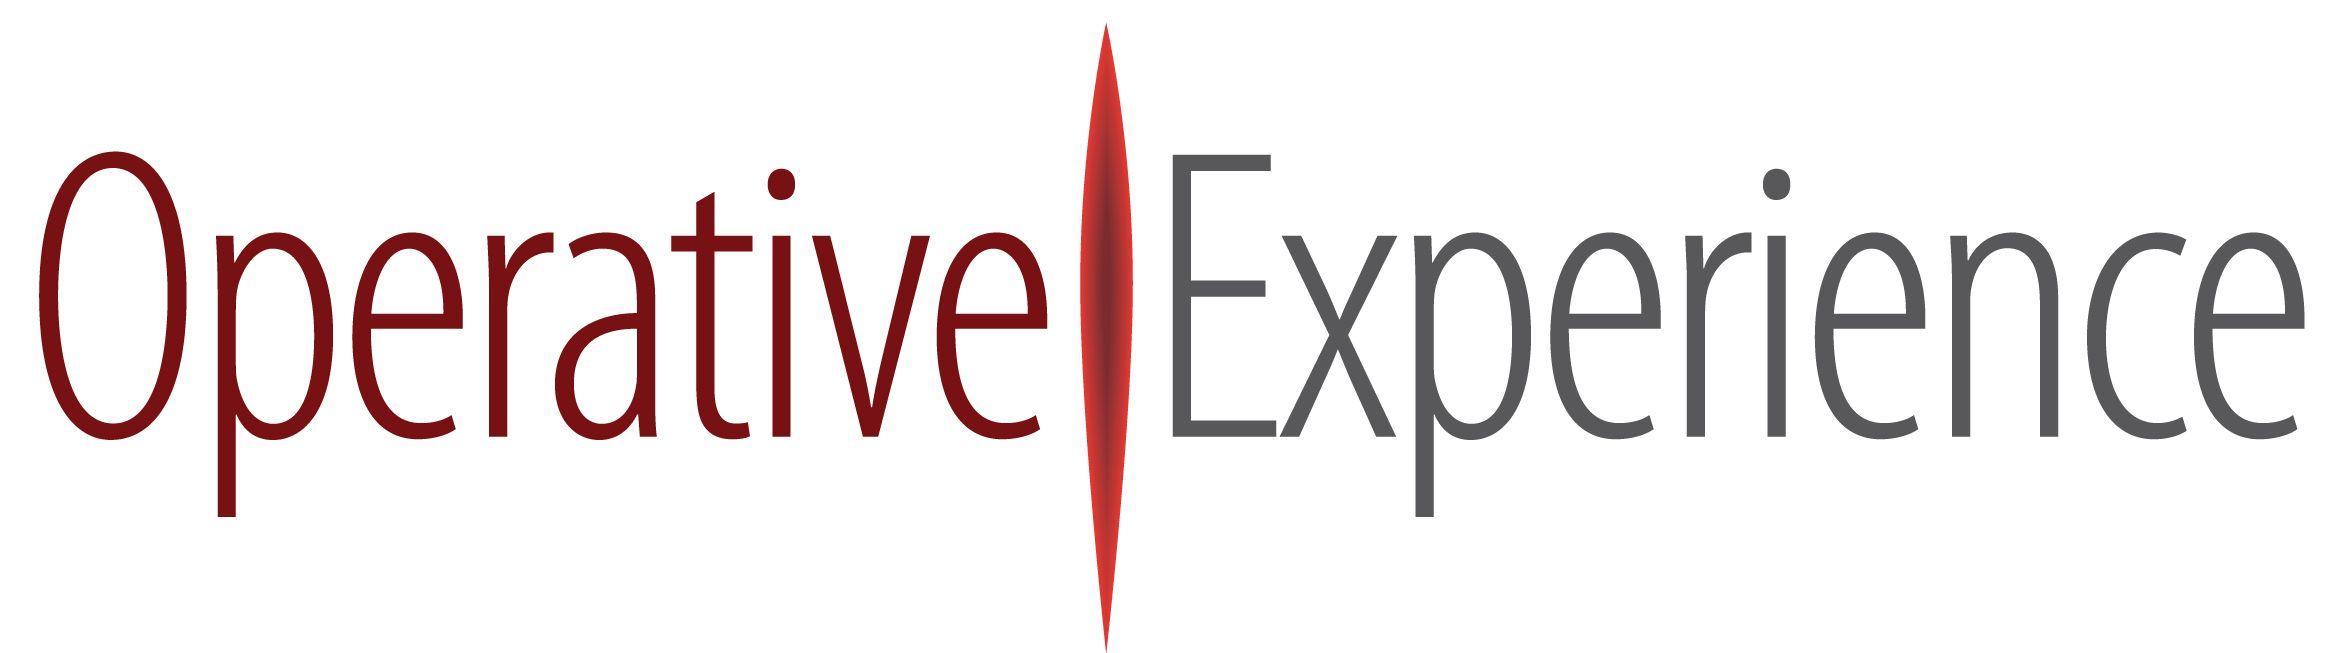 Operative Experience, Inc. Logo